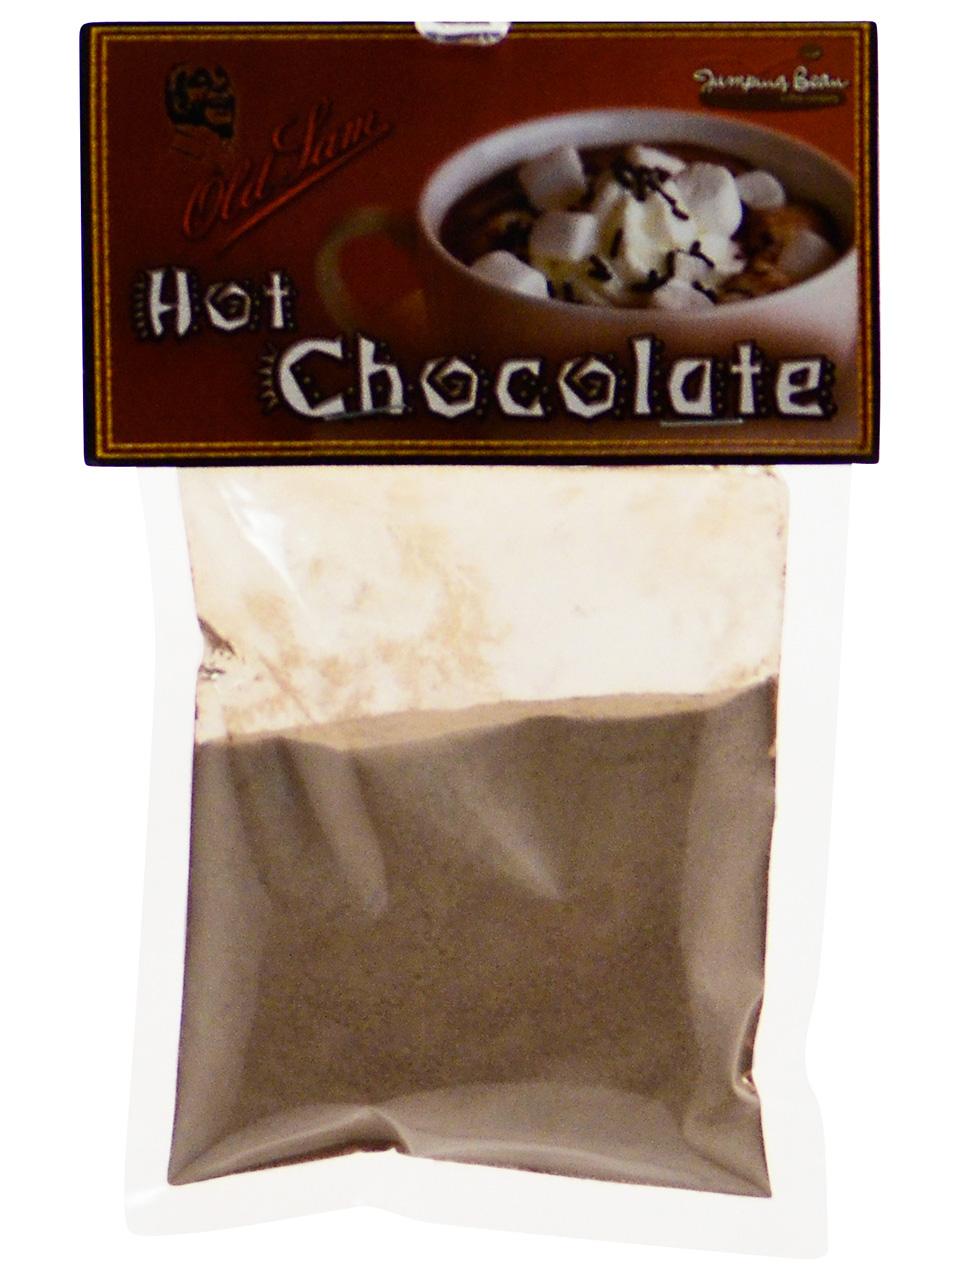 Old Sam Hot Chocolate Packs